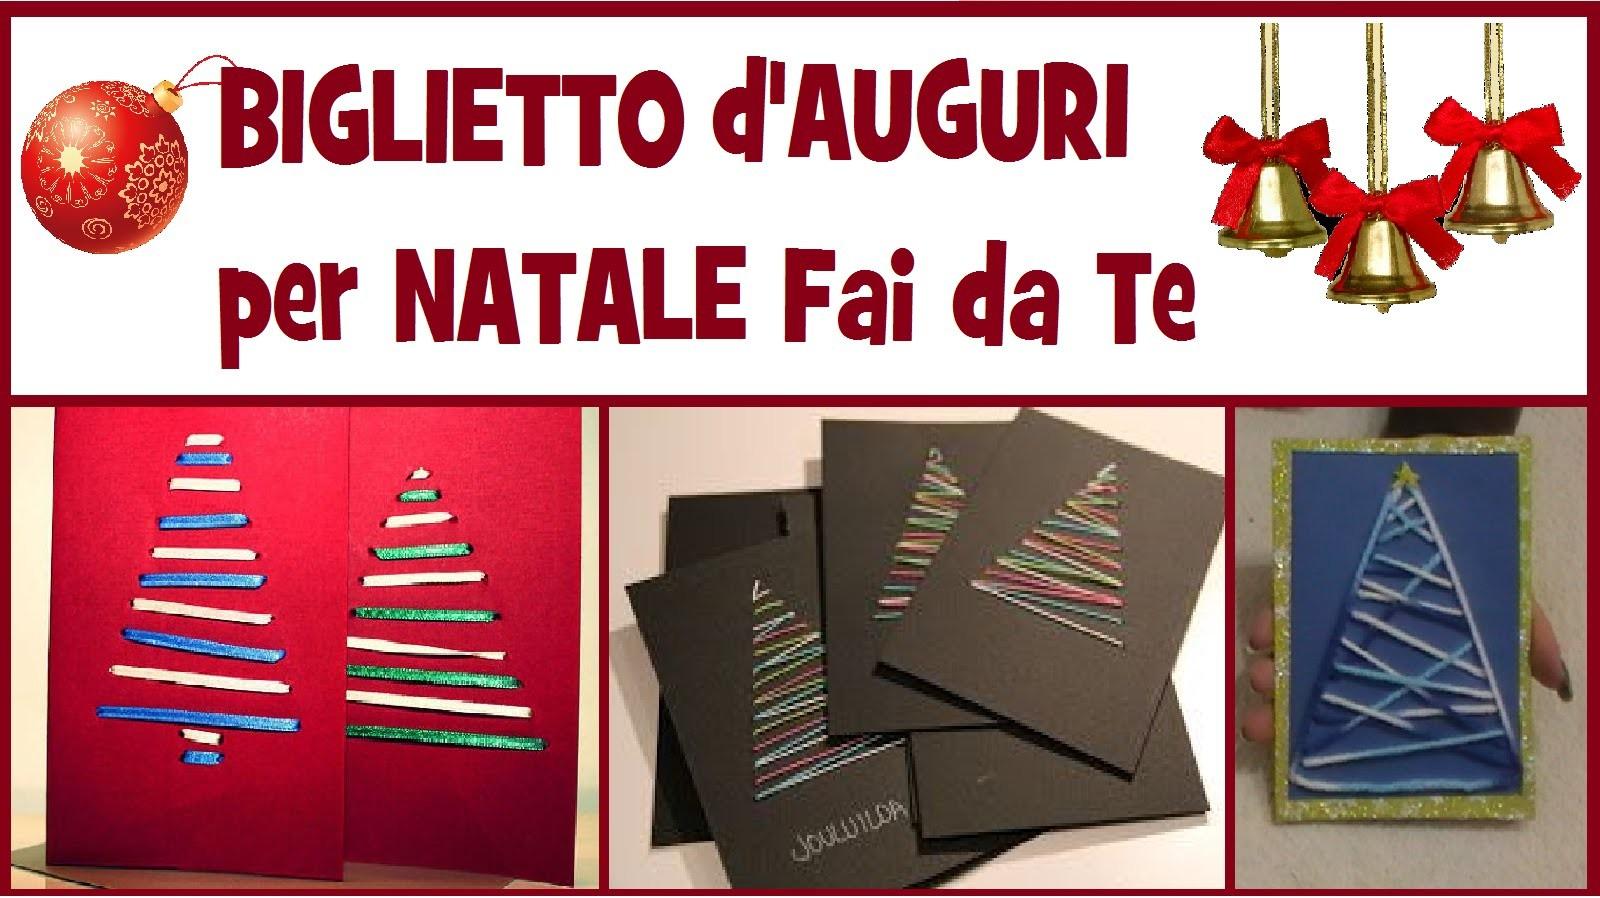 Biglietto d'Auguri per Natale Fai da Te - DIY CHRISTMAS GREETINGS CARD